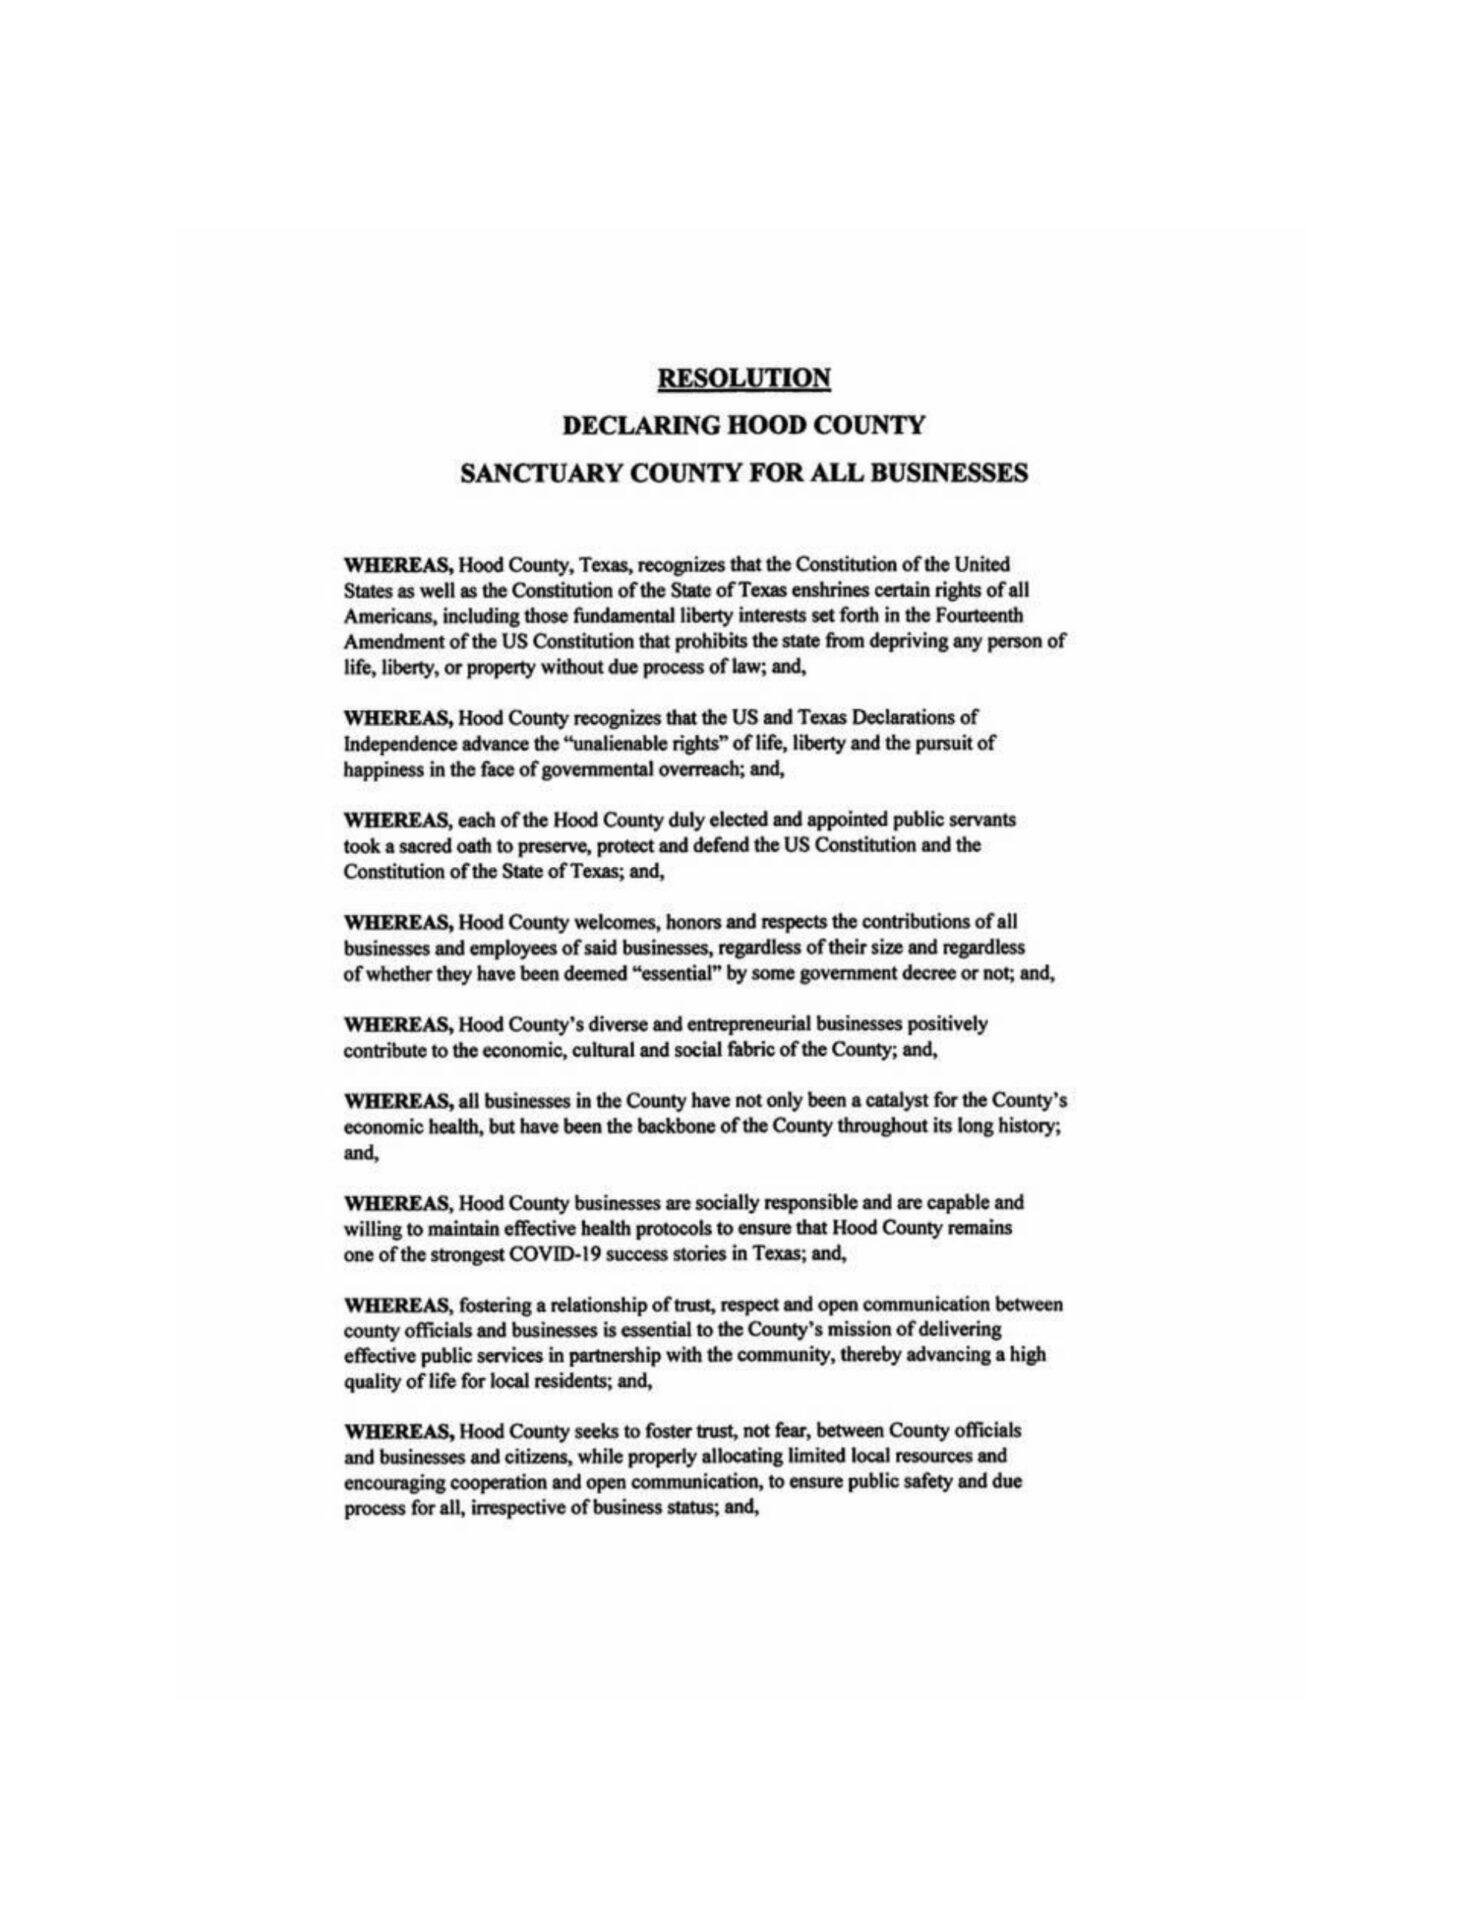 Hood County Texas Business Sanctuary Resolution pg-1